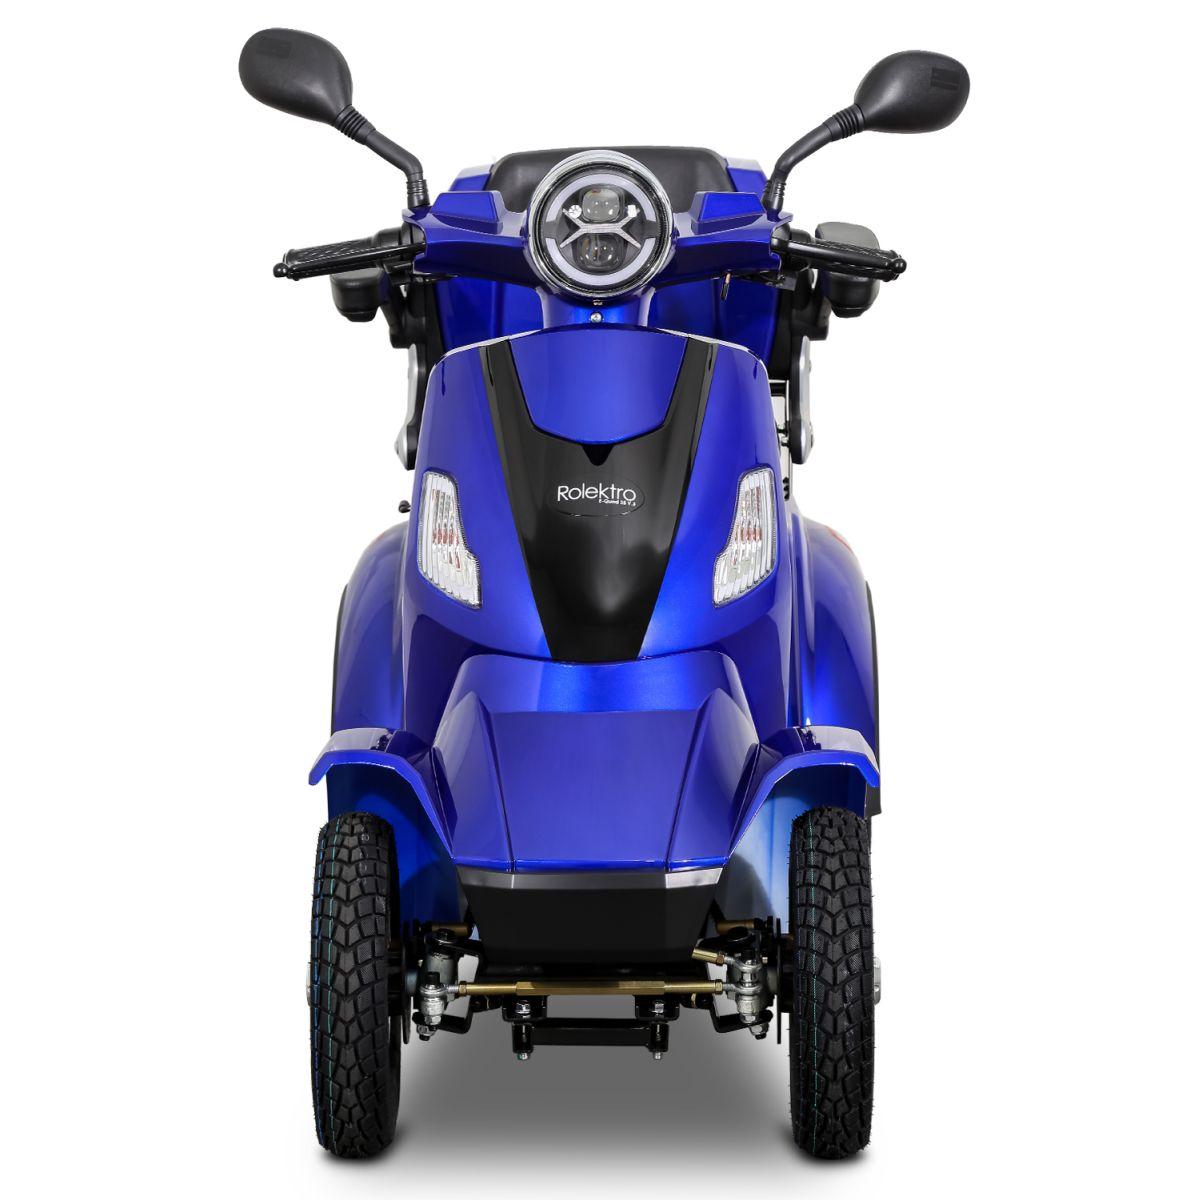 Seniorenmobil Elektromobil Elektroroller Rolektro Quad 25BG blau Bild 1